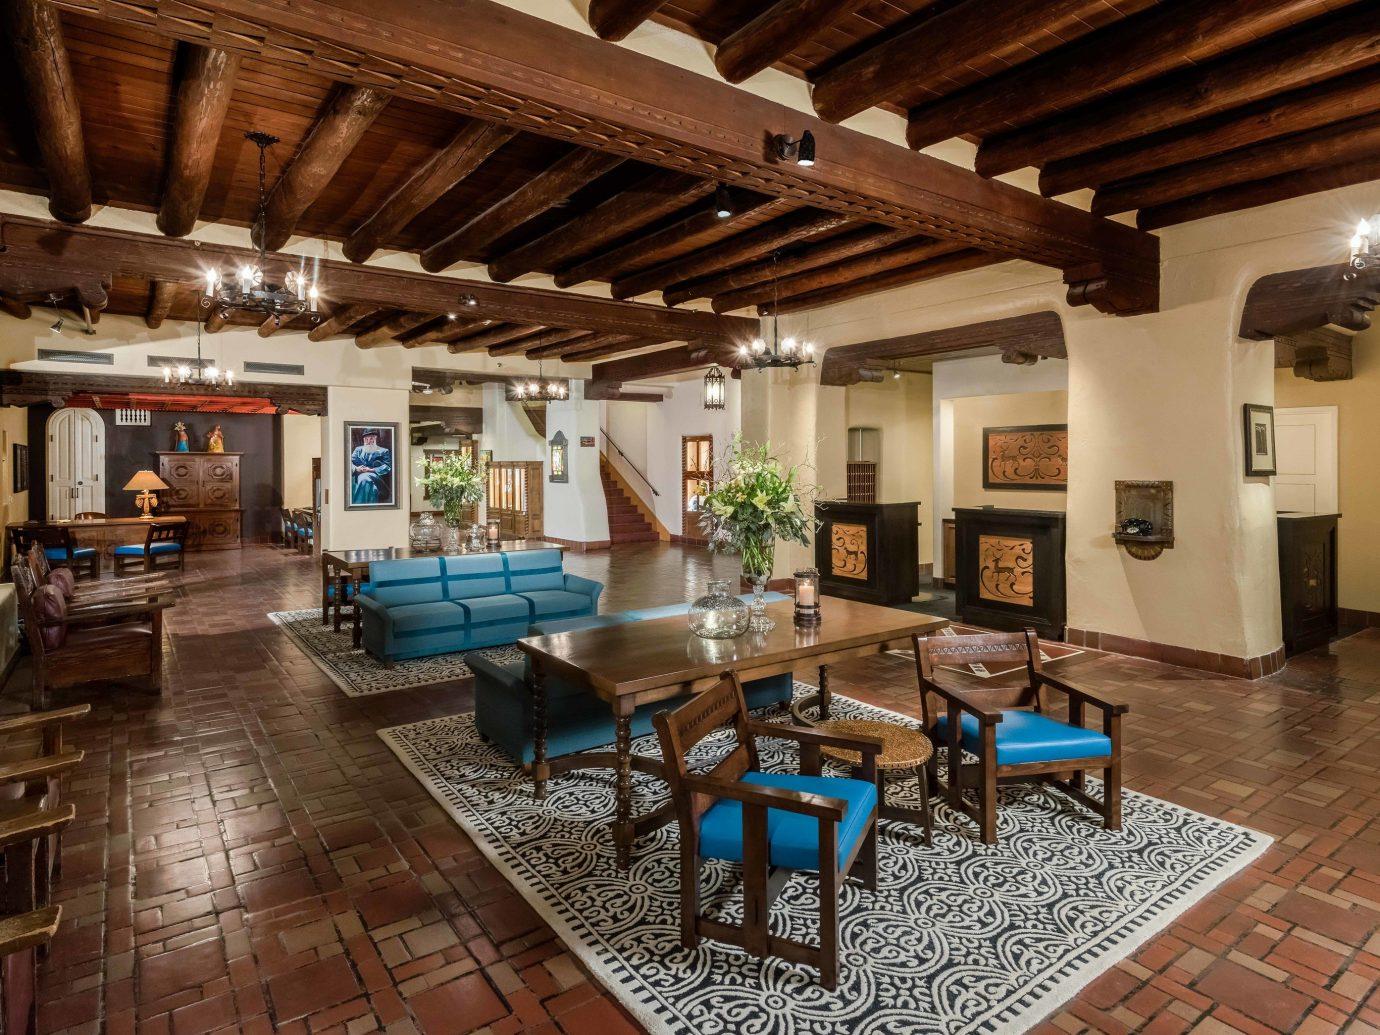 floor indoor room Living ceiling furniture chair Lobby interior design living room real estate area estate wood